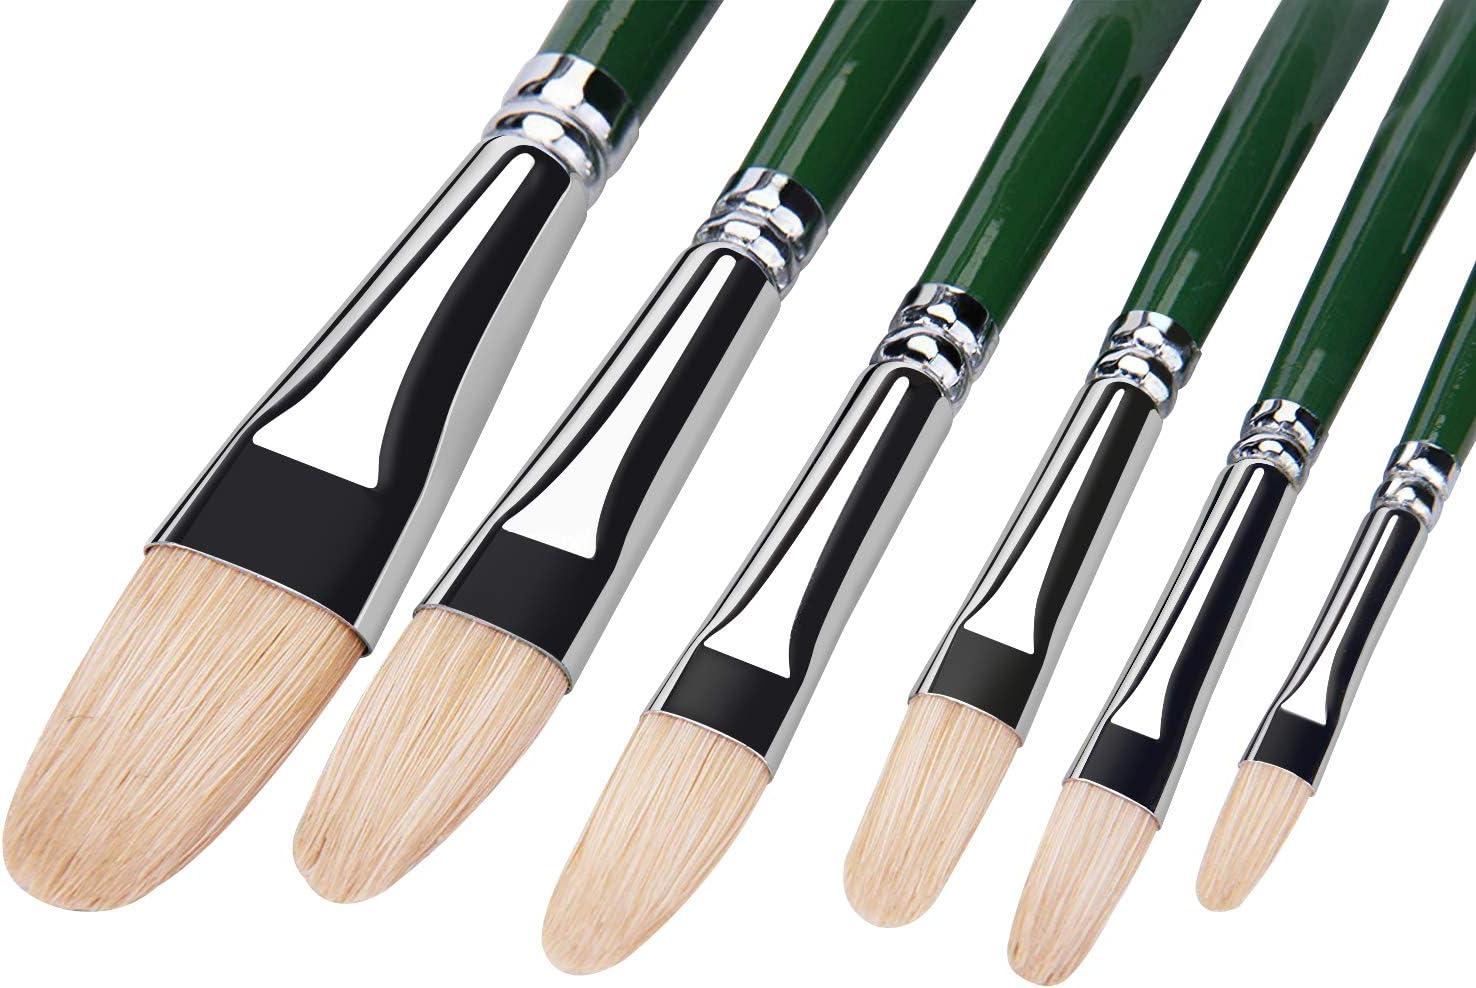 Oil Acrylic Watercolor Paint Brushes 100% Natural Chungking Hog Hair 6pc Filbert Paint brush Set